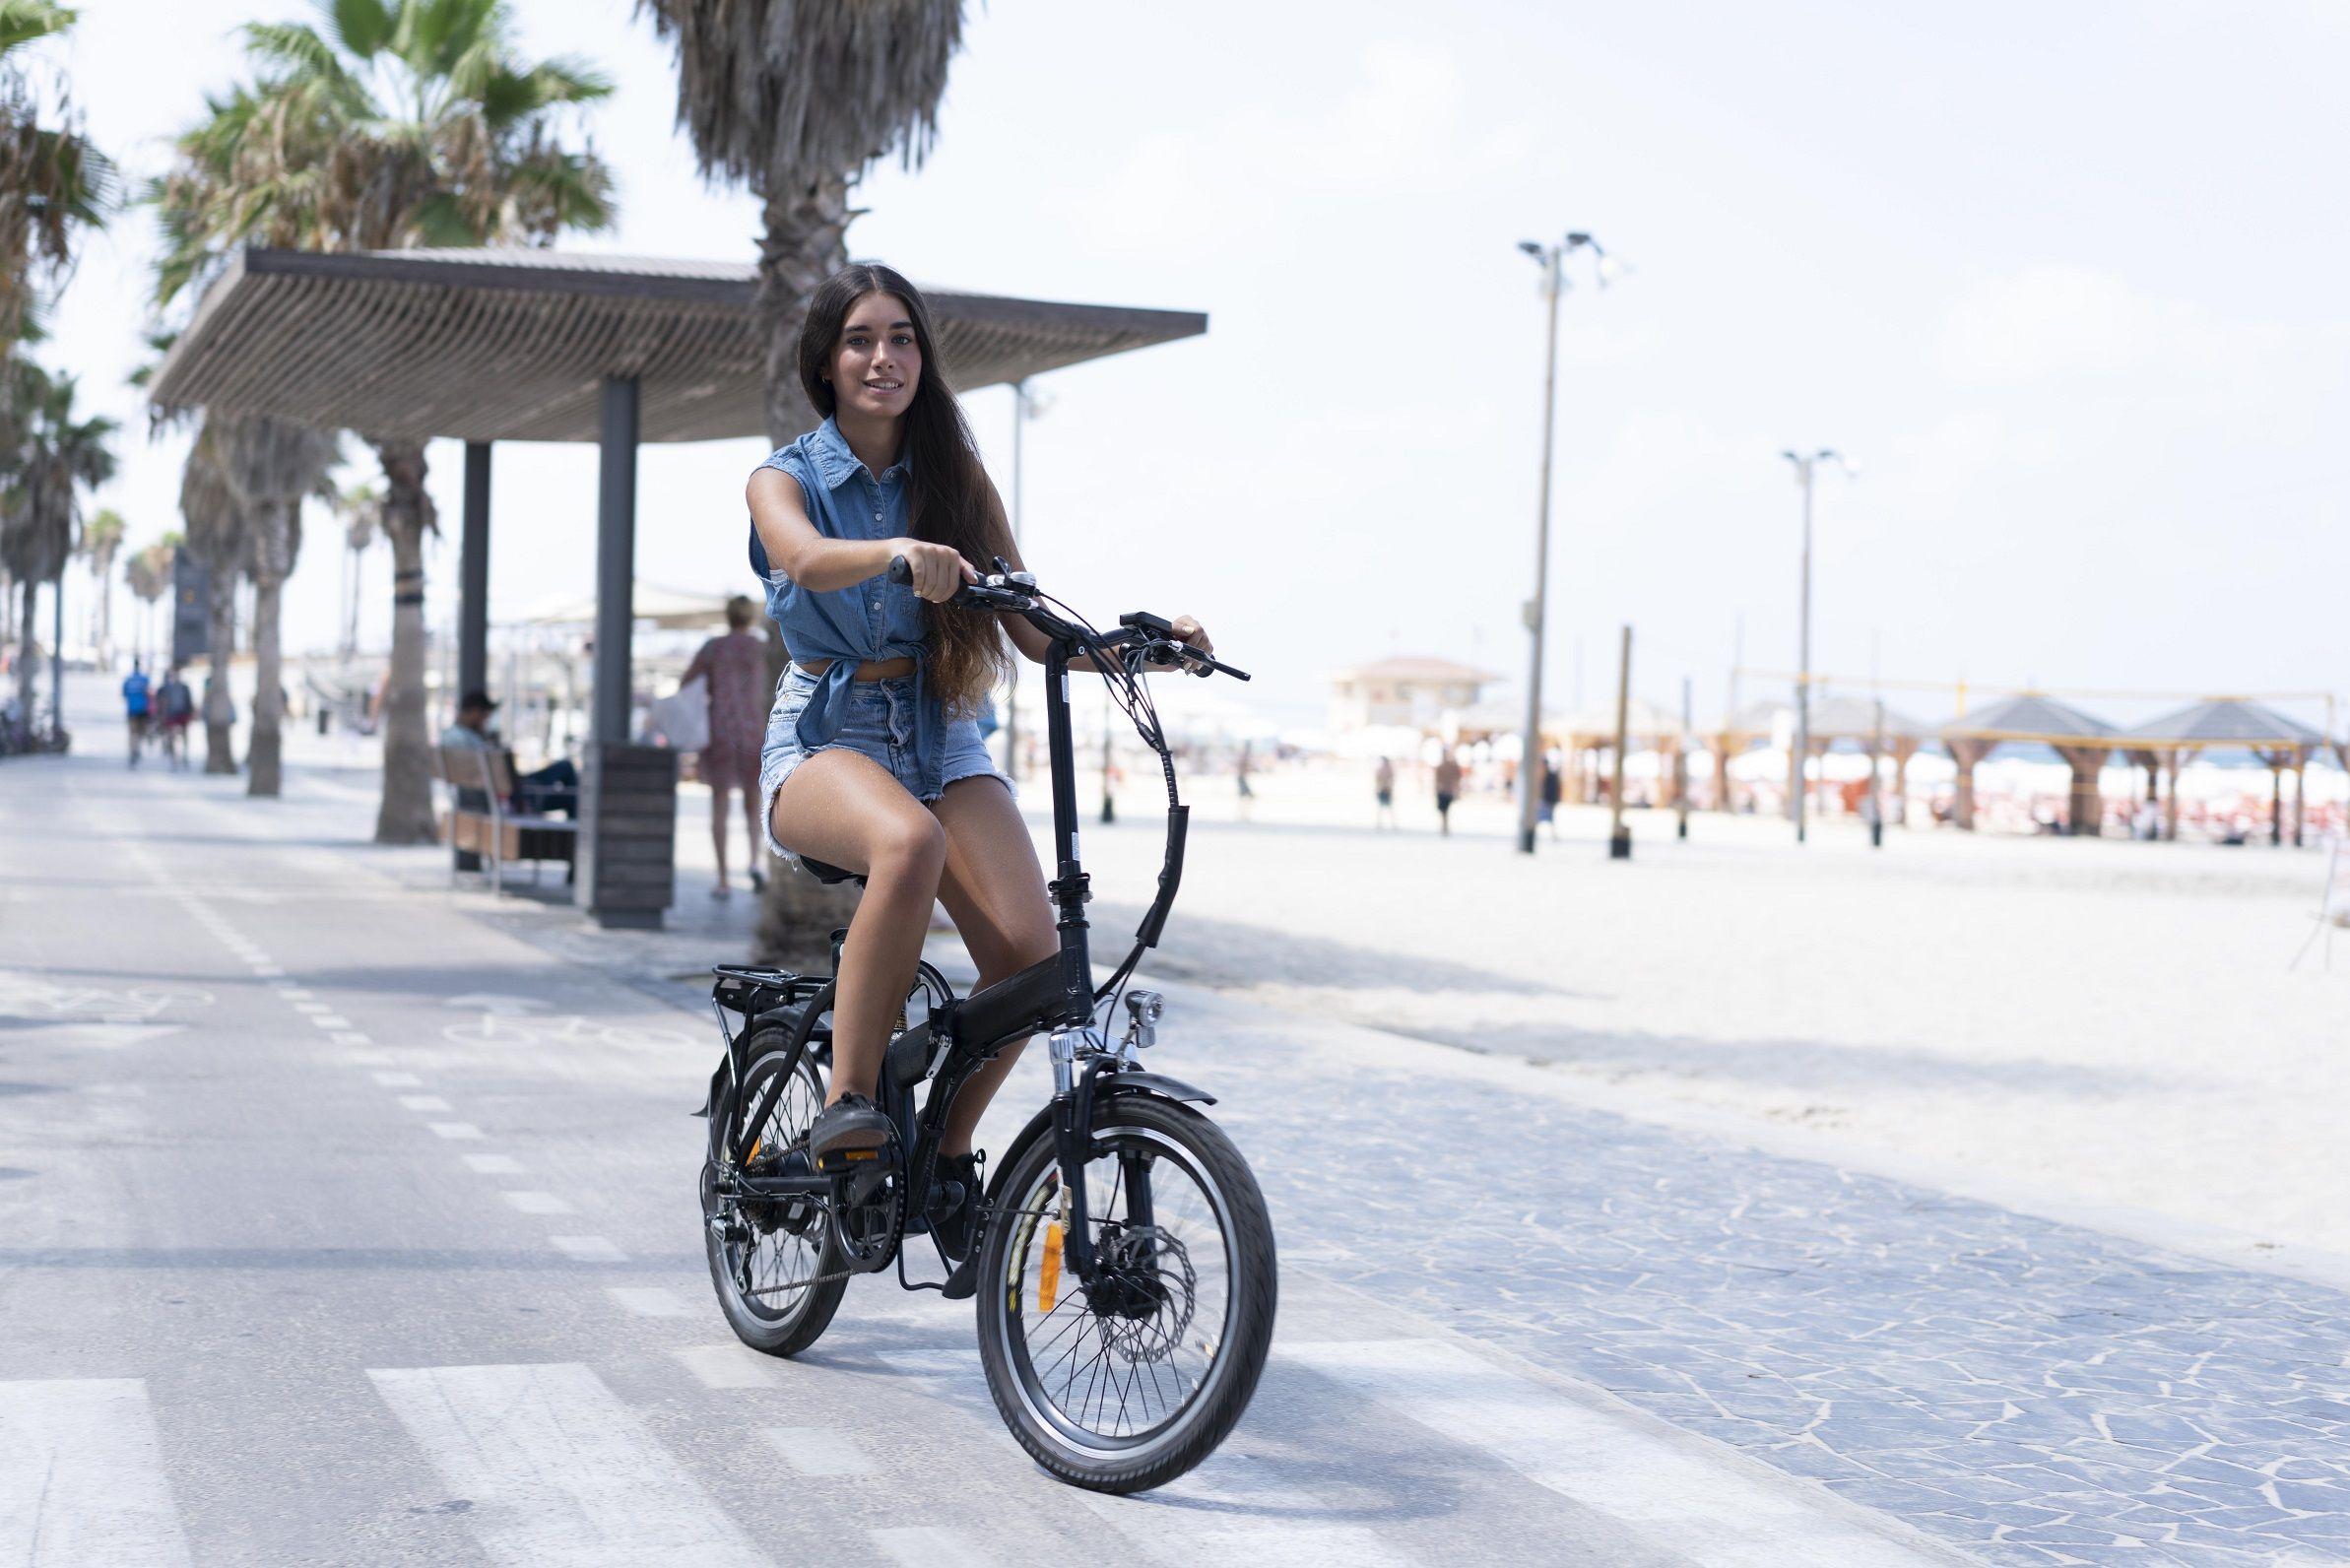 , no risk ראשון לציון, אופניים חשמליים ראשון לציון, חנות אופניים ראשון לציון